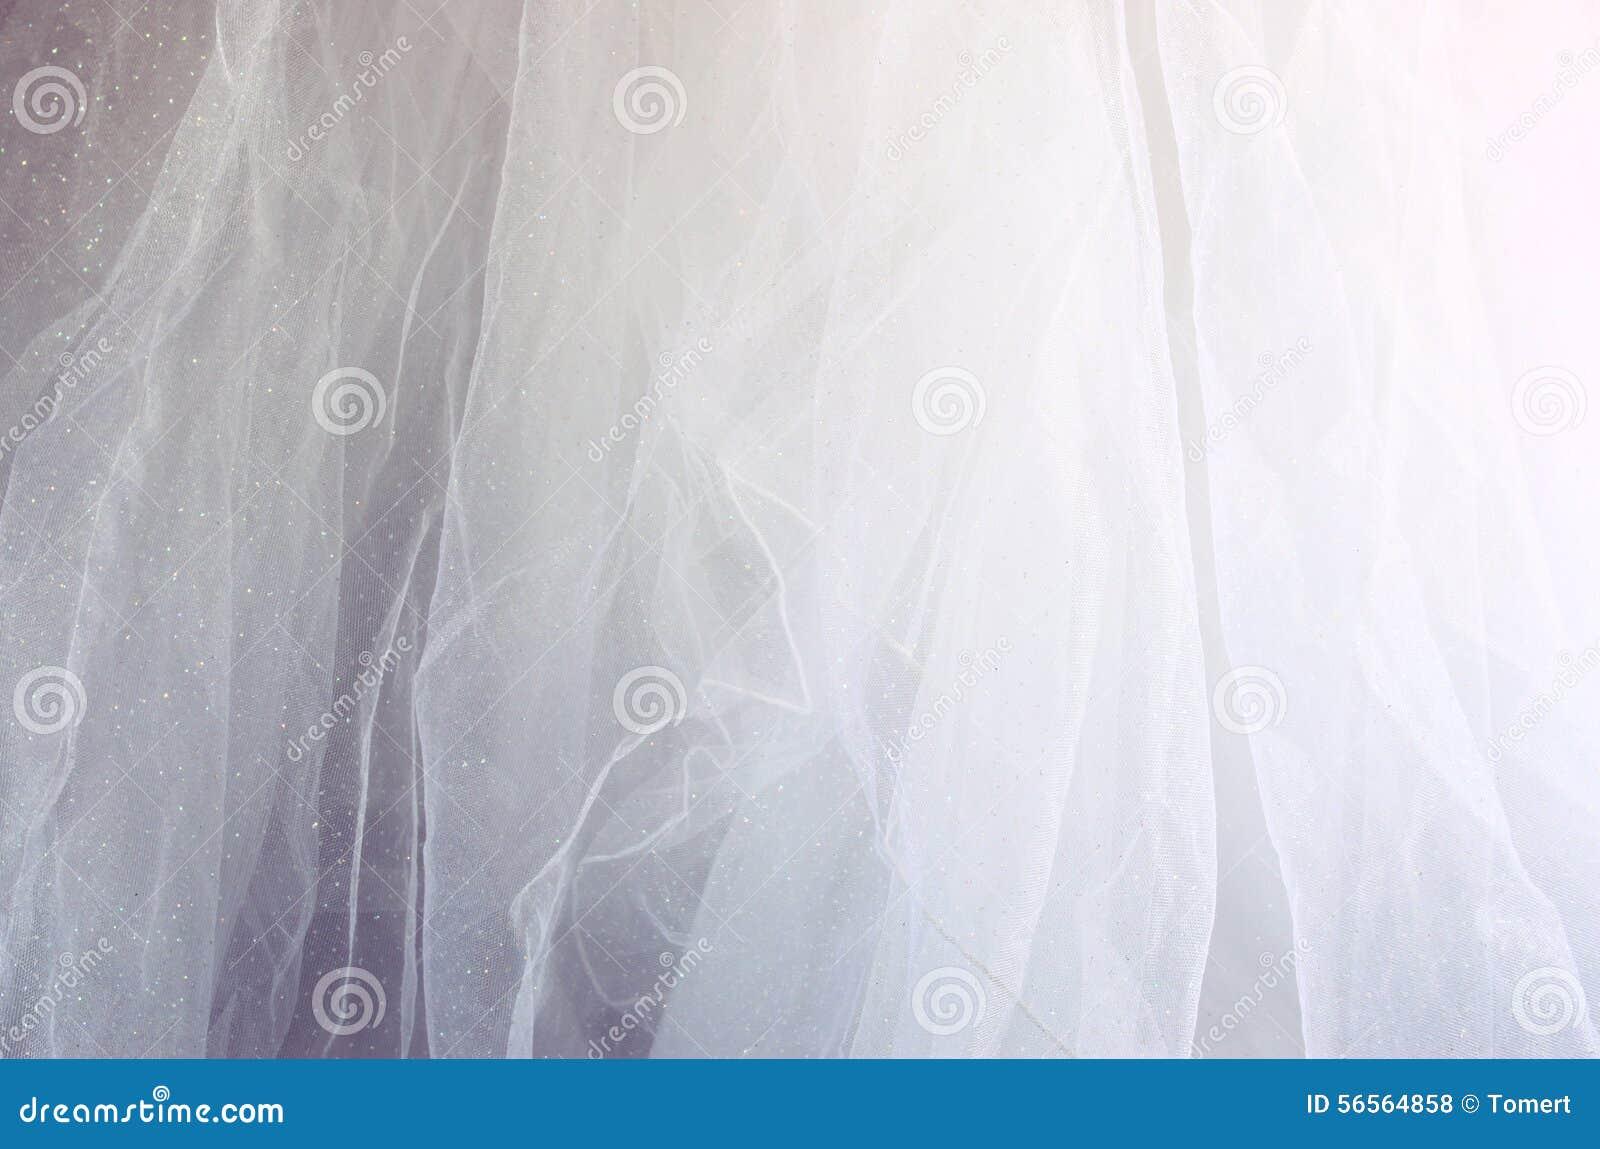 Download Εκλεκτής ποιότητας υπόβαθρο σύστασης σιφόν του Tulle γάμος σκαλοπατιών πορτρέτου φορεμάτων έννοιας νυφών Στοκ Εικόνες - εικόνα από σχέδιο, εικόνα: 56564858